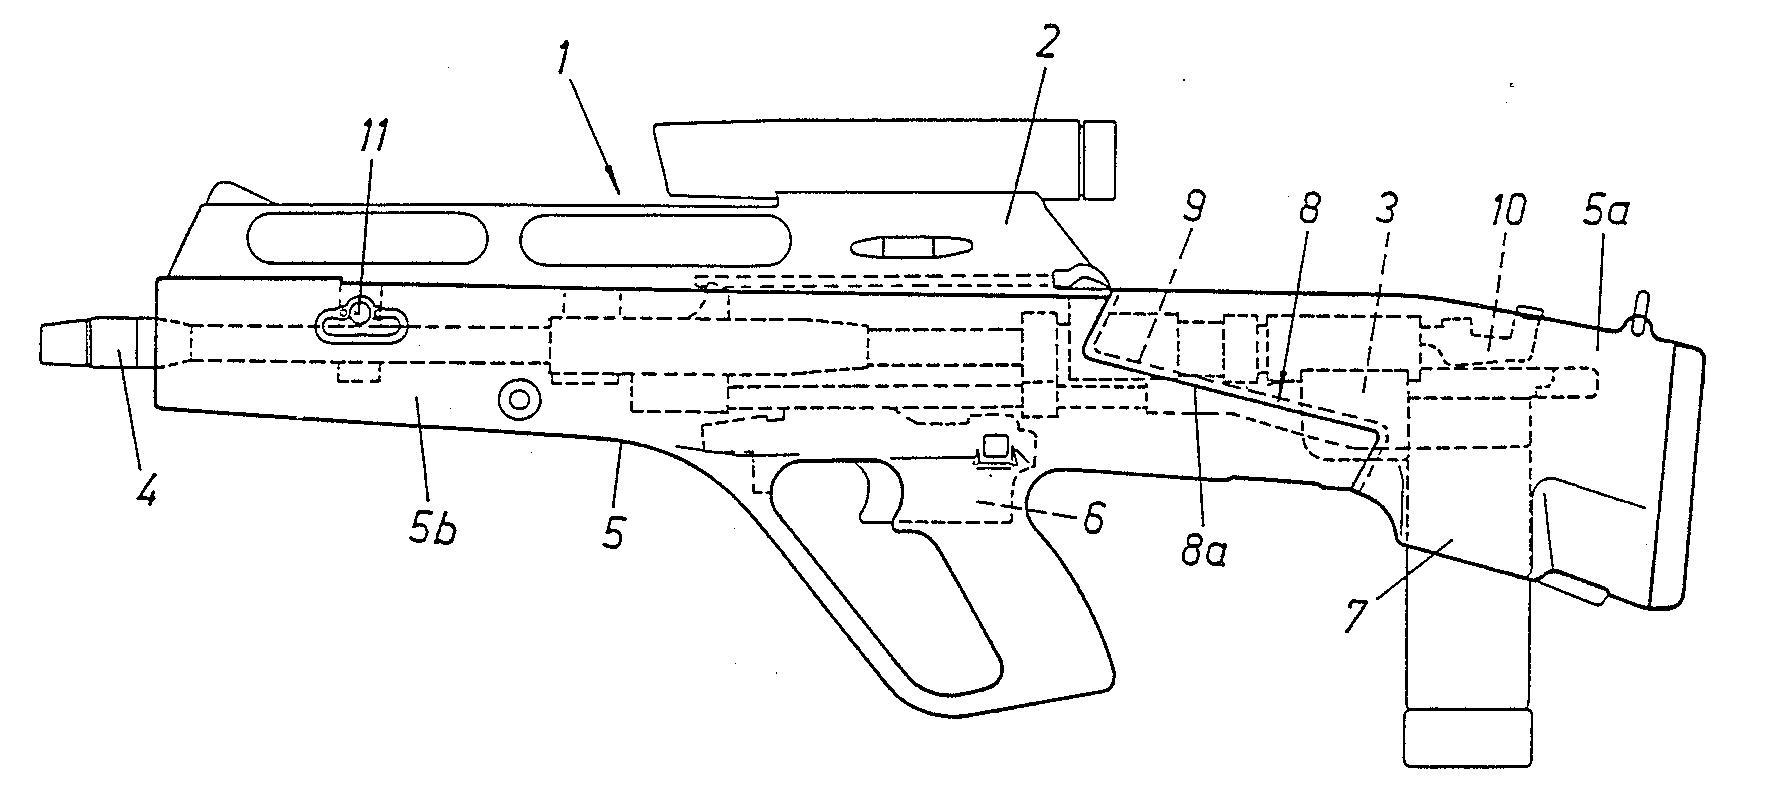 Steyr ACR (Advanced Combat Rifle) layout schematic